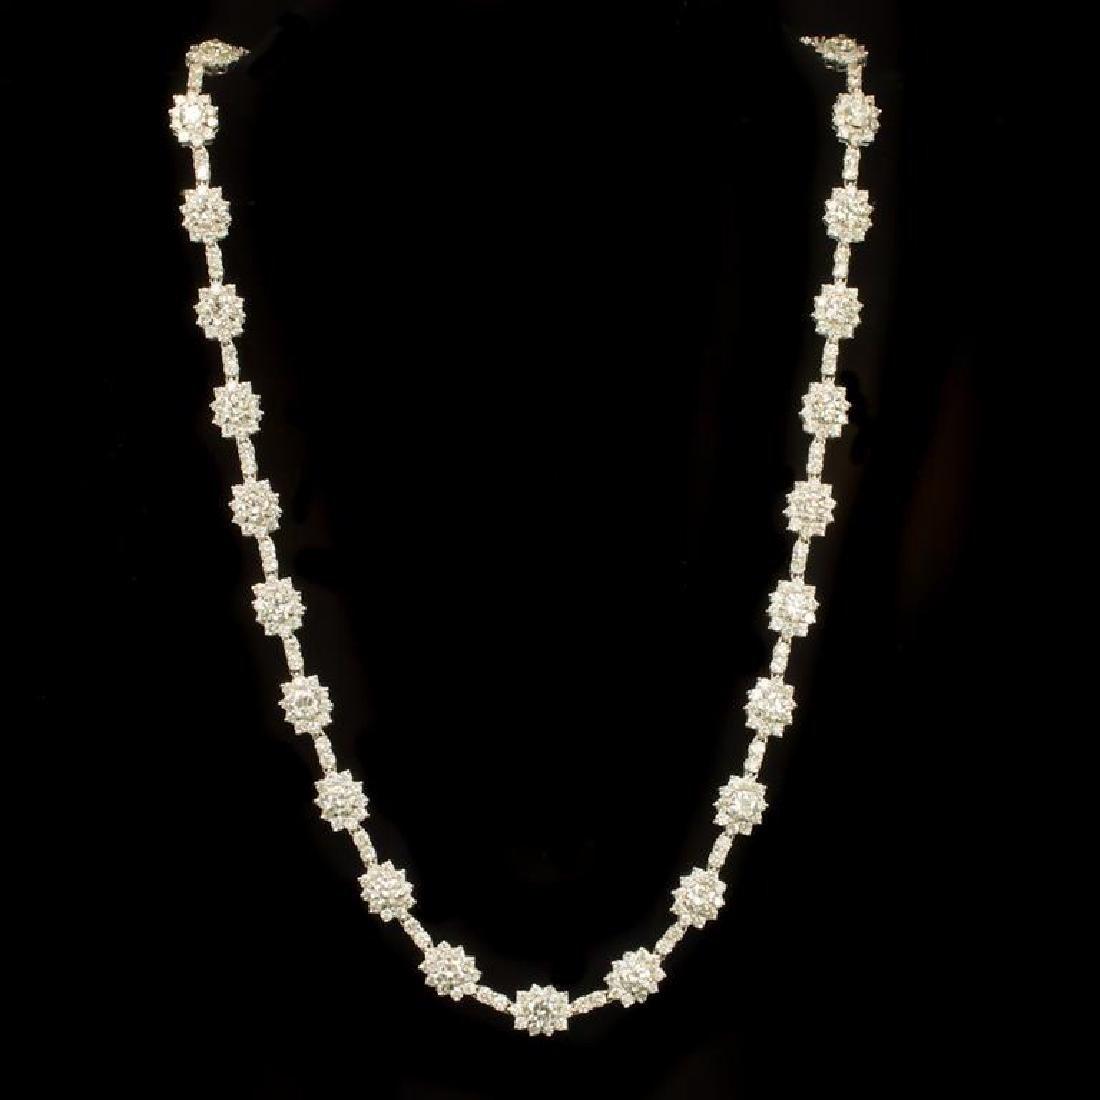 18K Gold 18.22ct Diamond Necklace - 2